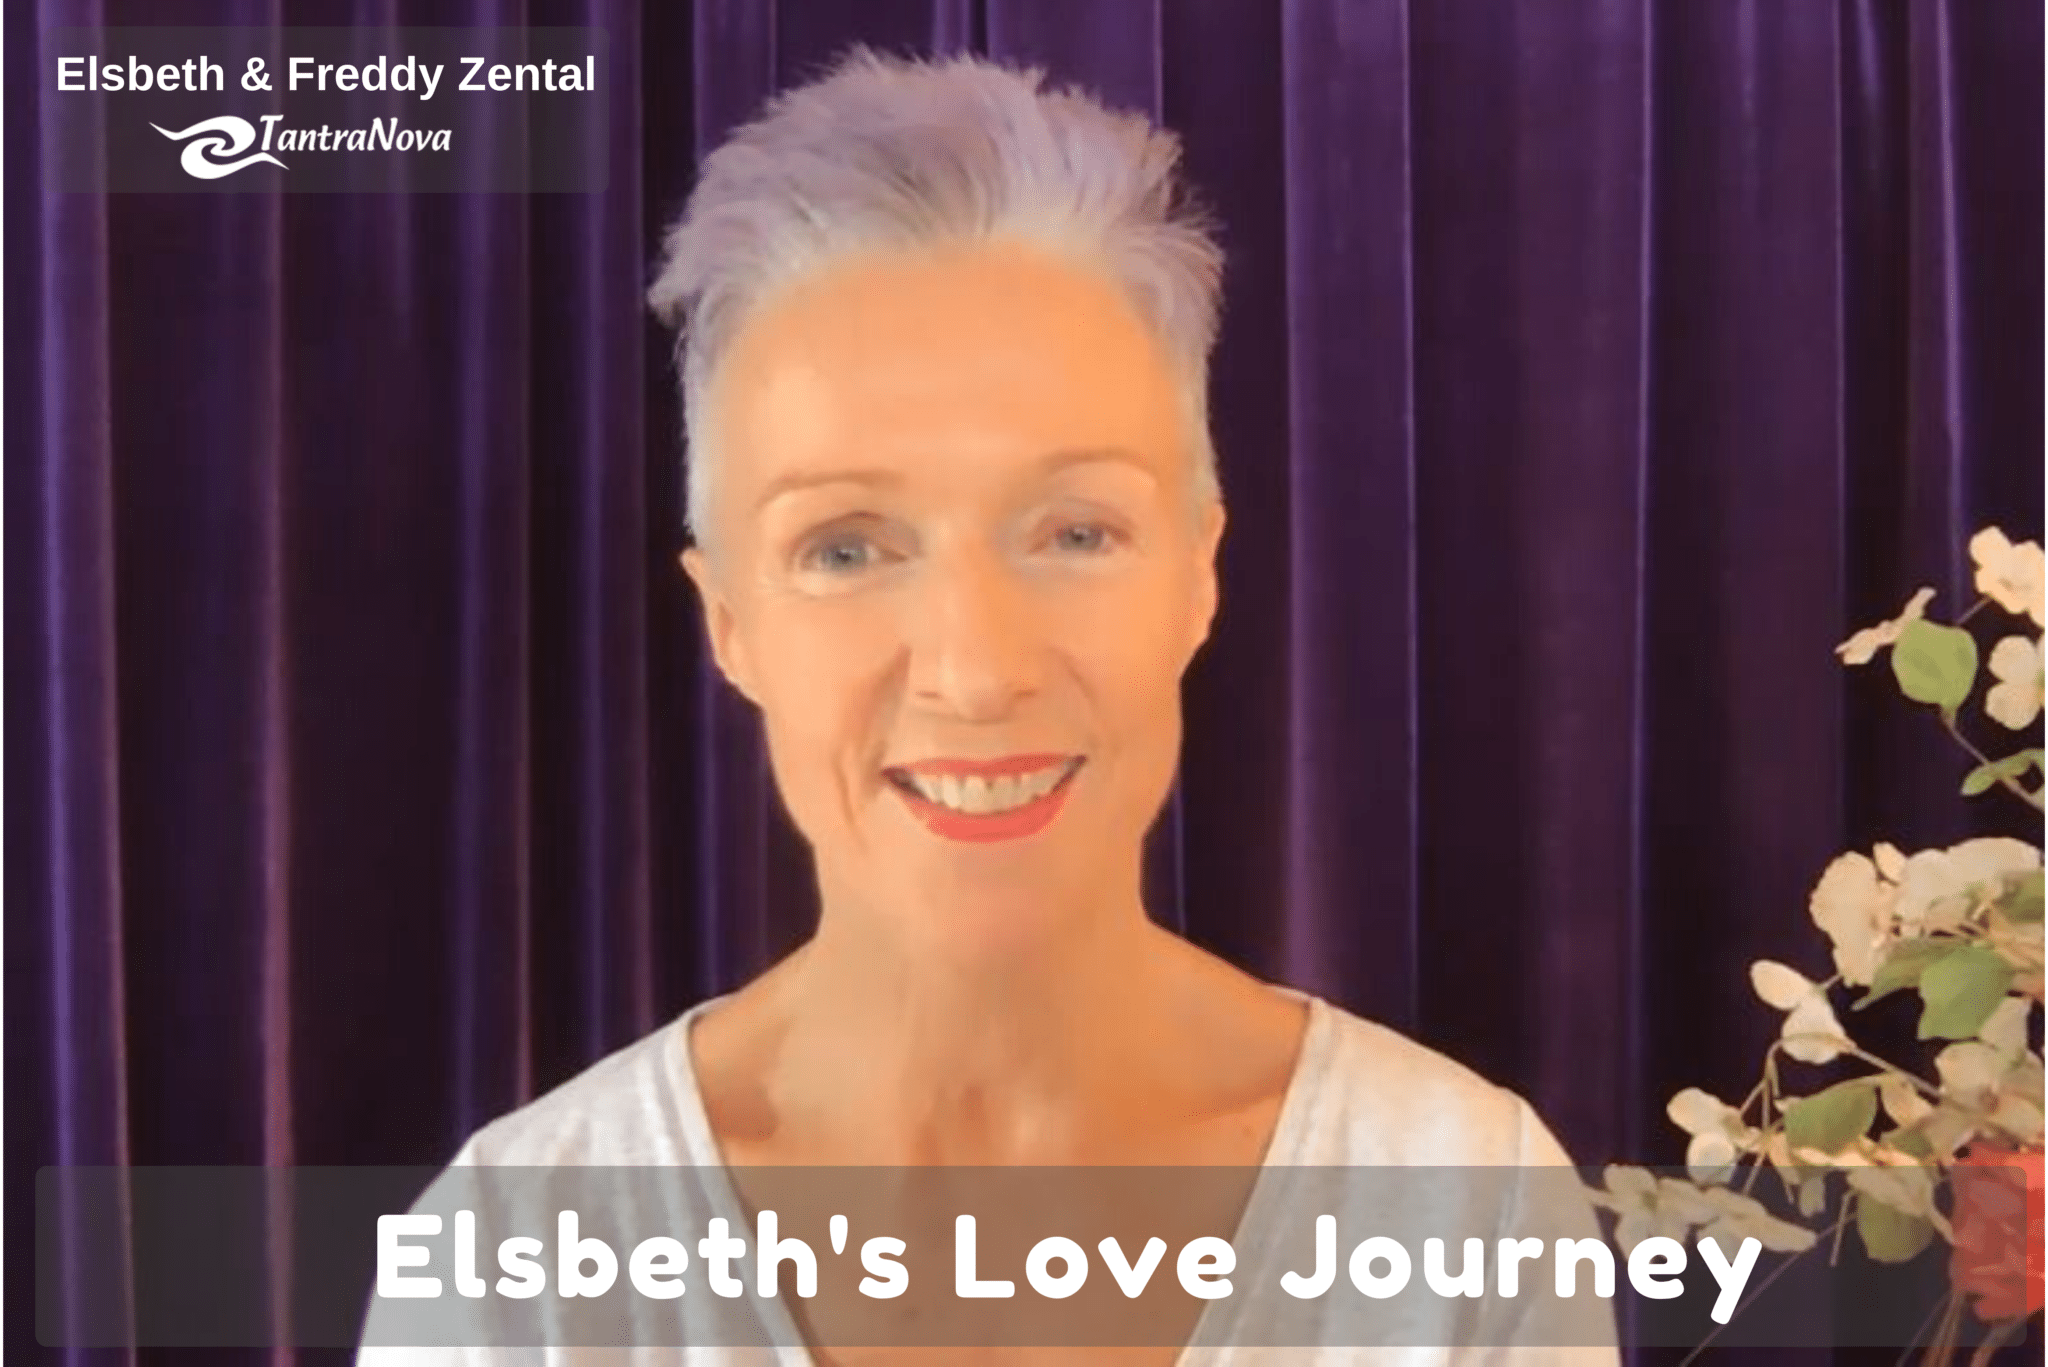 Elsbeth's Love Journey